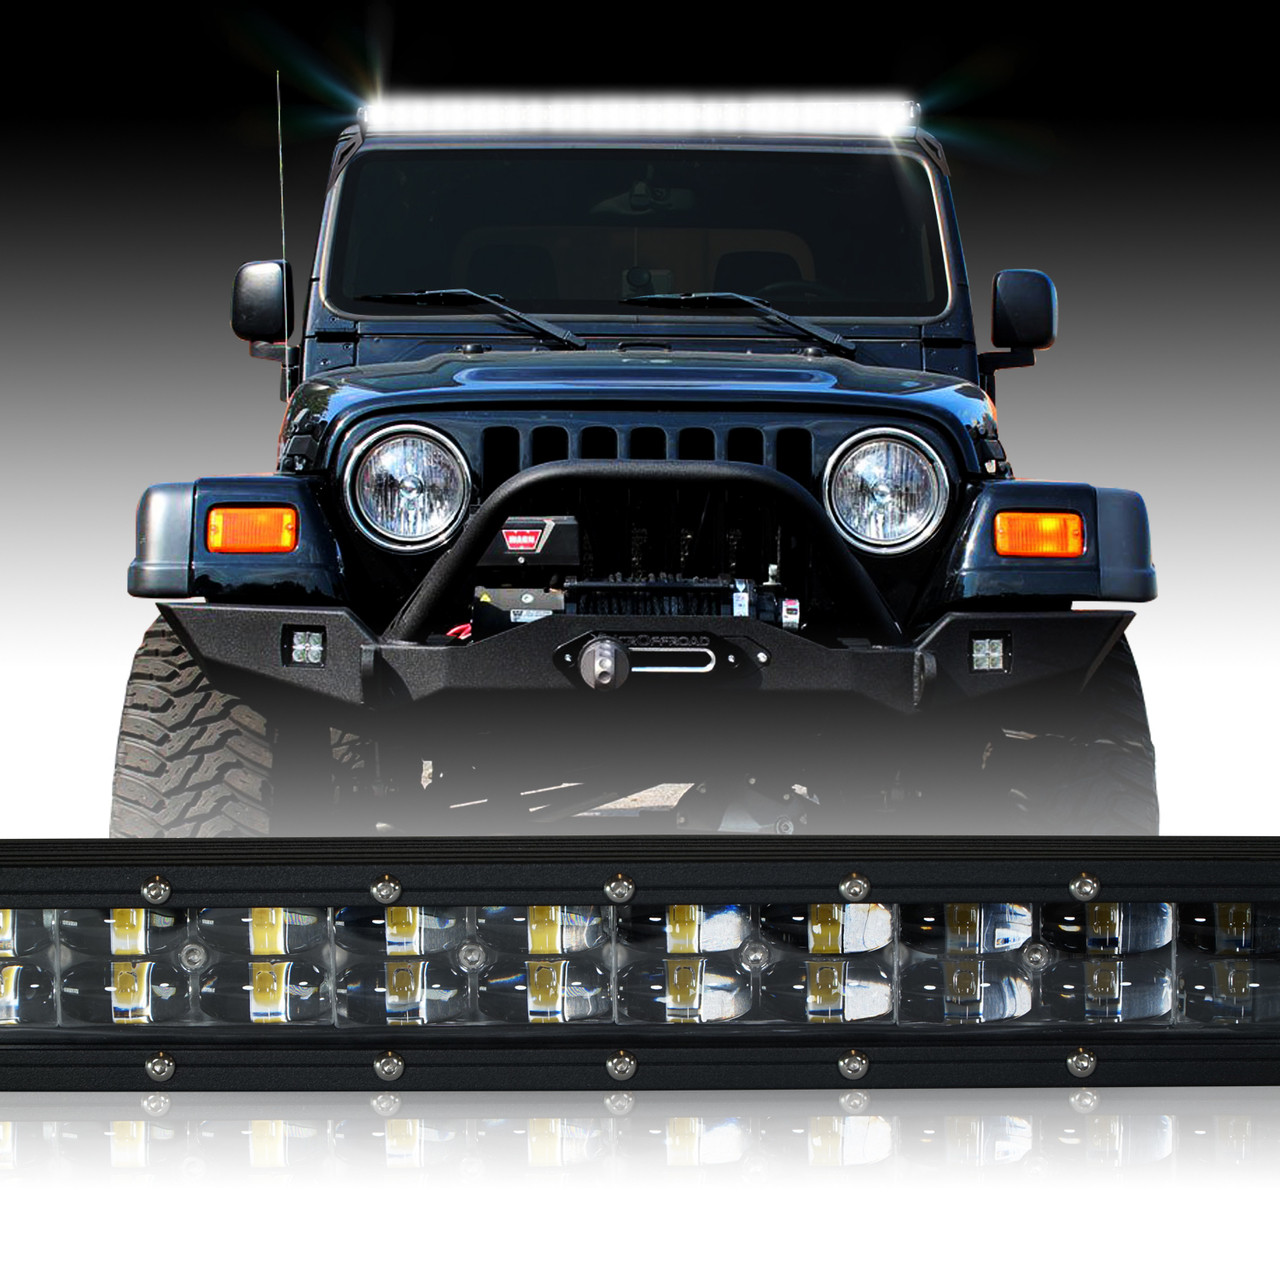 Jeep Yj Rear Wiper Wiring Diagram | Wiring Liry Jeep Yj Rear Wiper Wiring Diagram on jeep yj cargo net, jeep yj tilt steering column, jeep yj fog lights, jeep yj led tail lights, jeep yj chrome grill, jeep yj automatic transmission, jeep yj tan interior, jeep yj steel wheels, jeep yj trailer hitch, jeep yj skid plate,